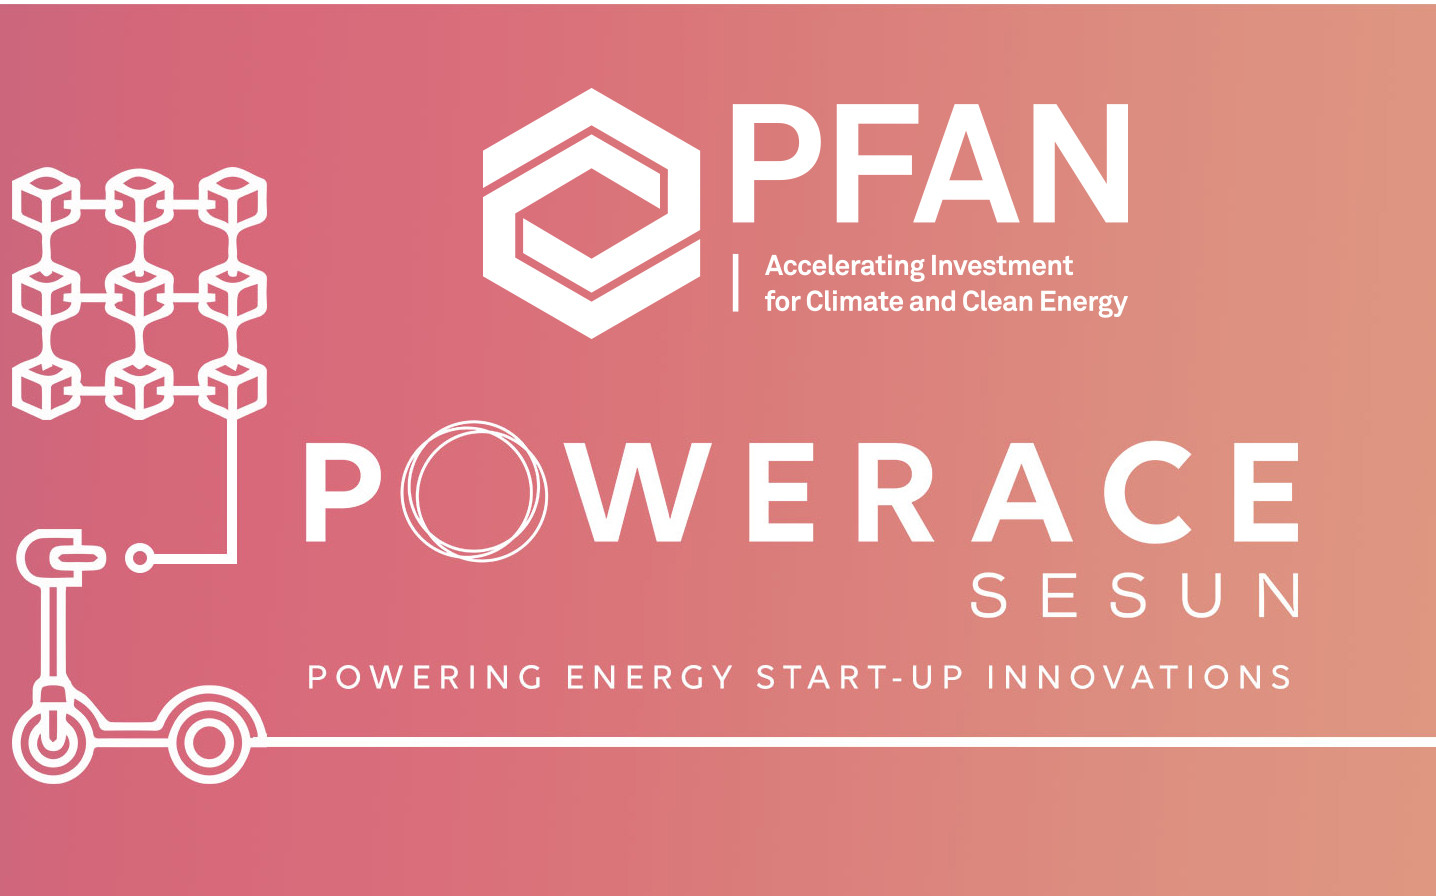 AI-driven Cloud-based Platform and Solar Panel Innovator: Big Winners at PowerACE 2020!